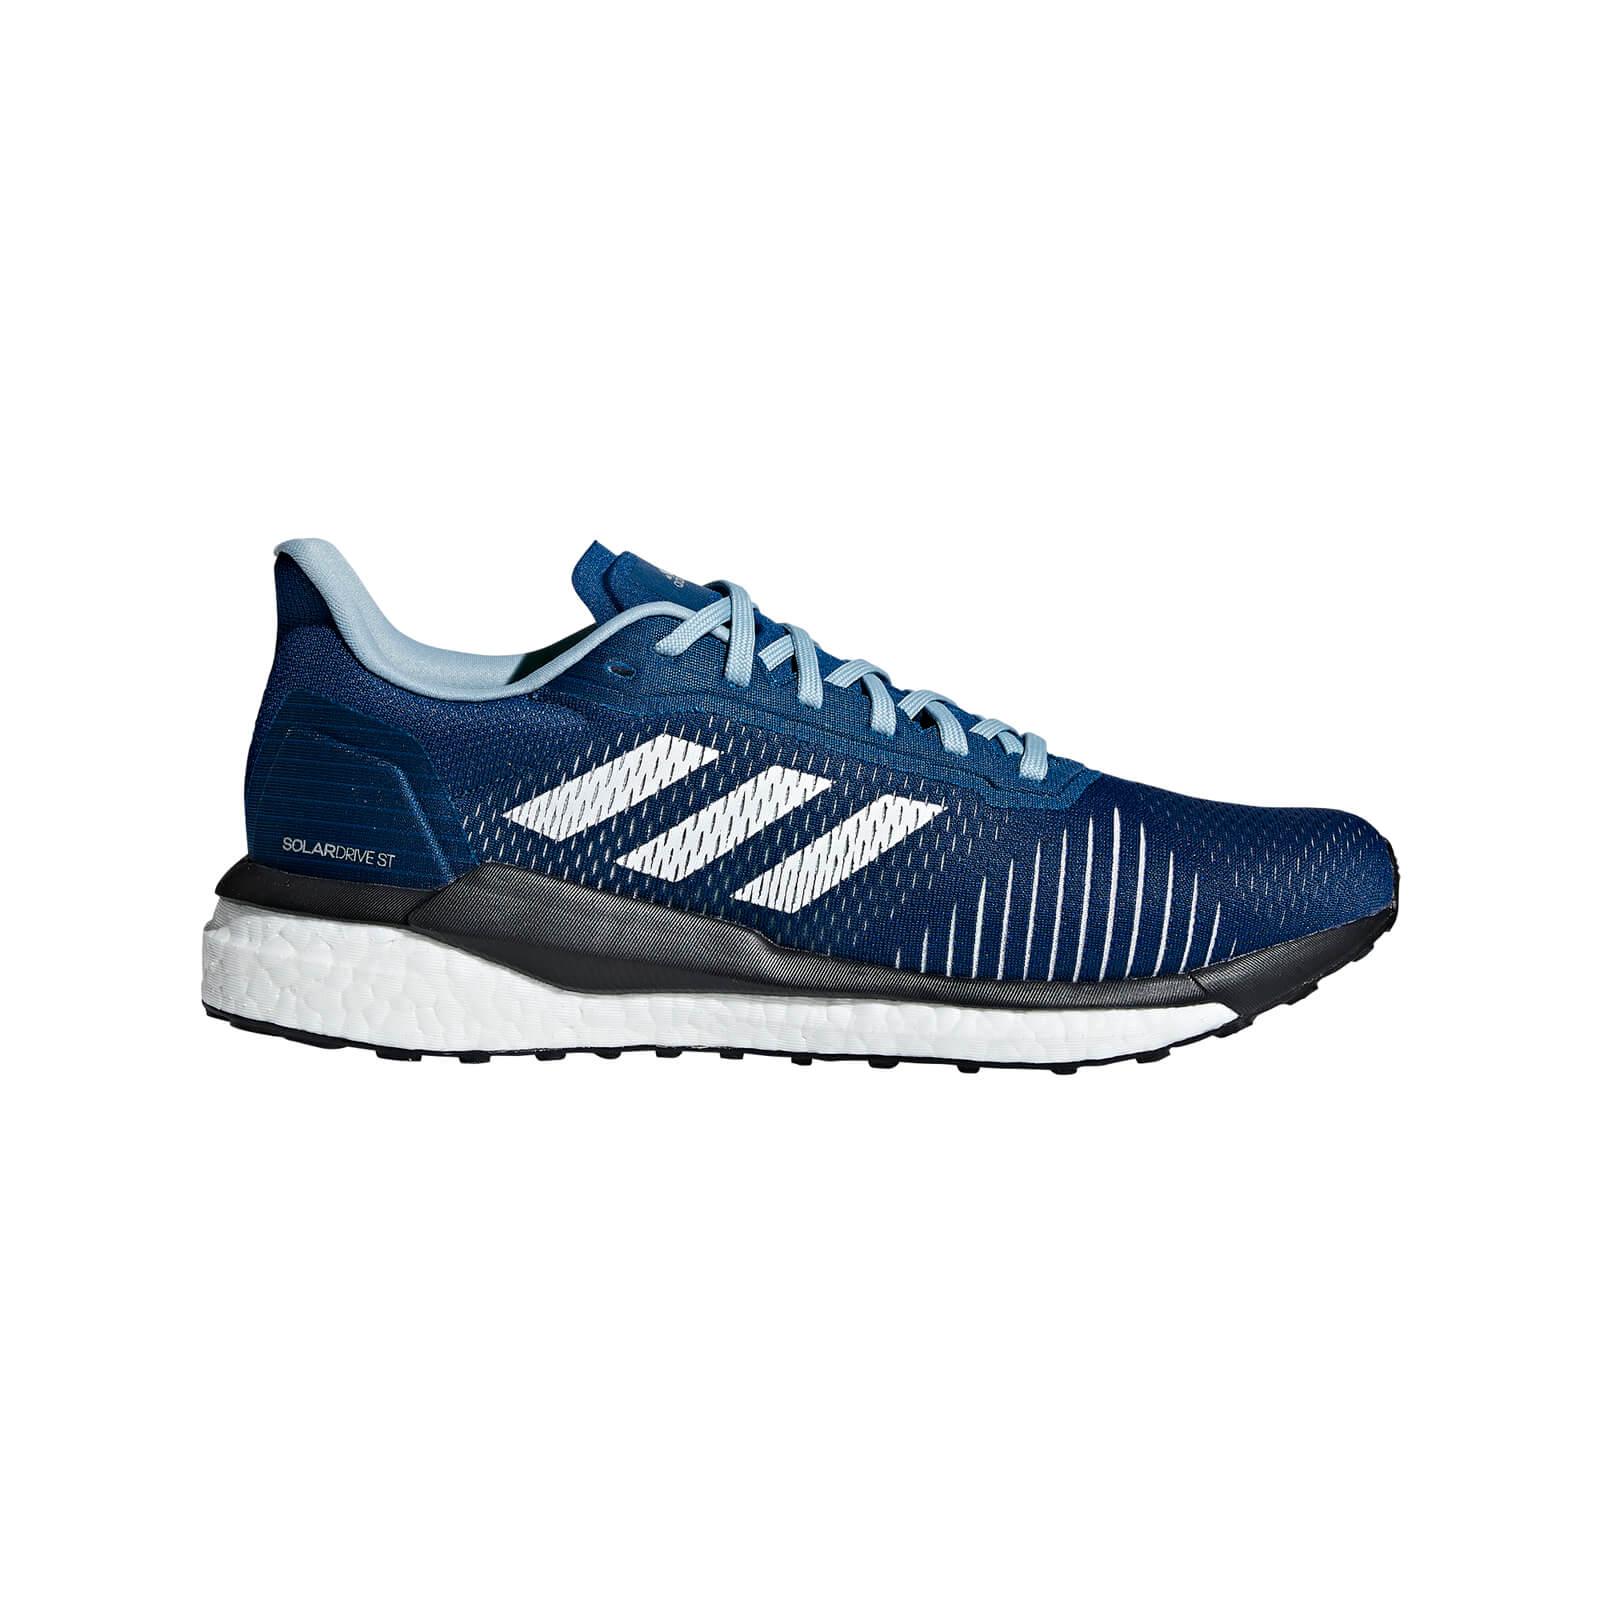 adidas Men's Solar Drive ST Running Shoes - Blue - US 8/UK 7.5 - Blue